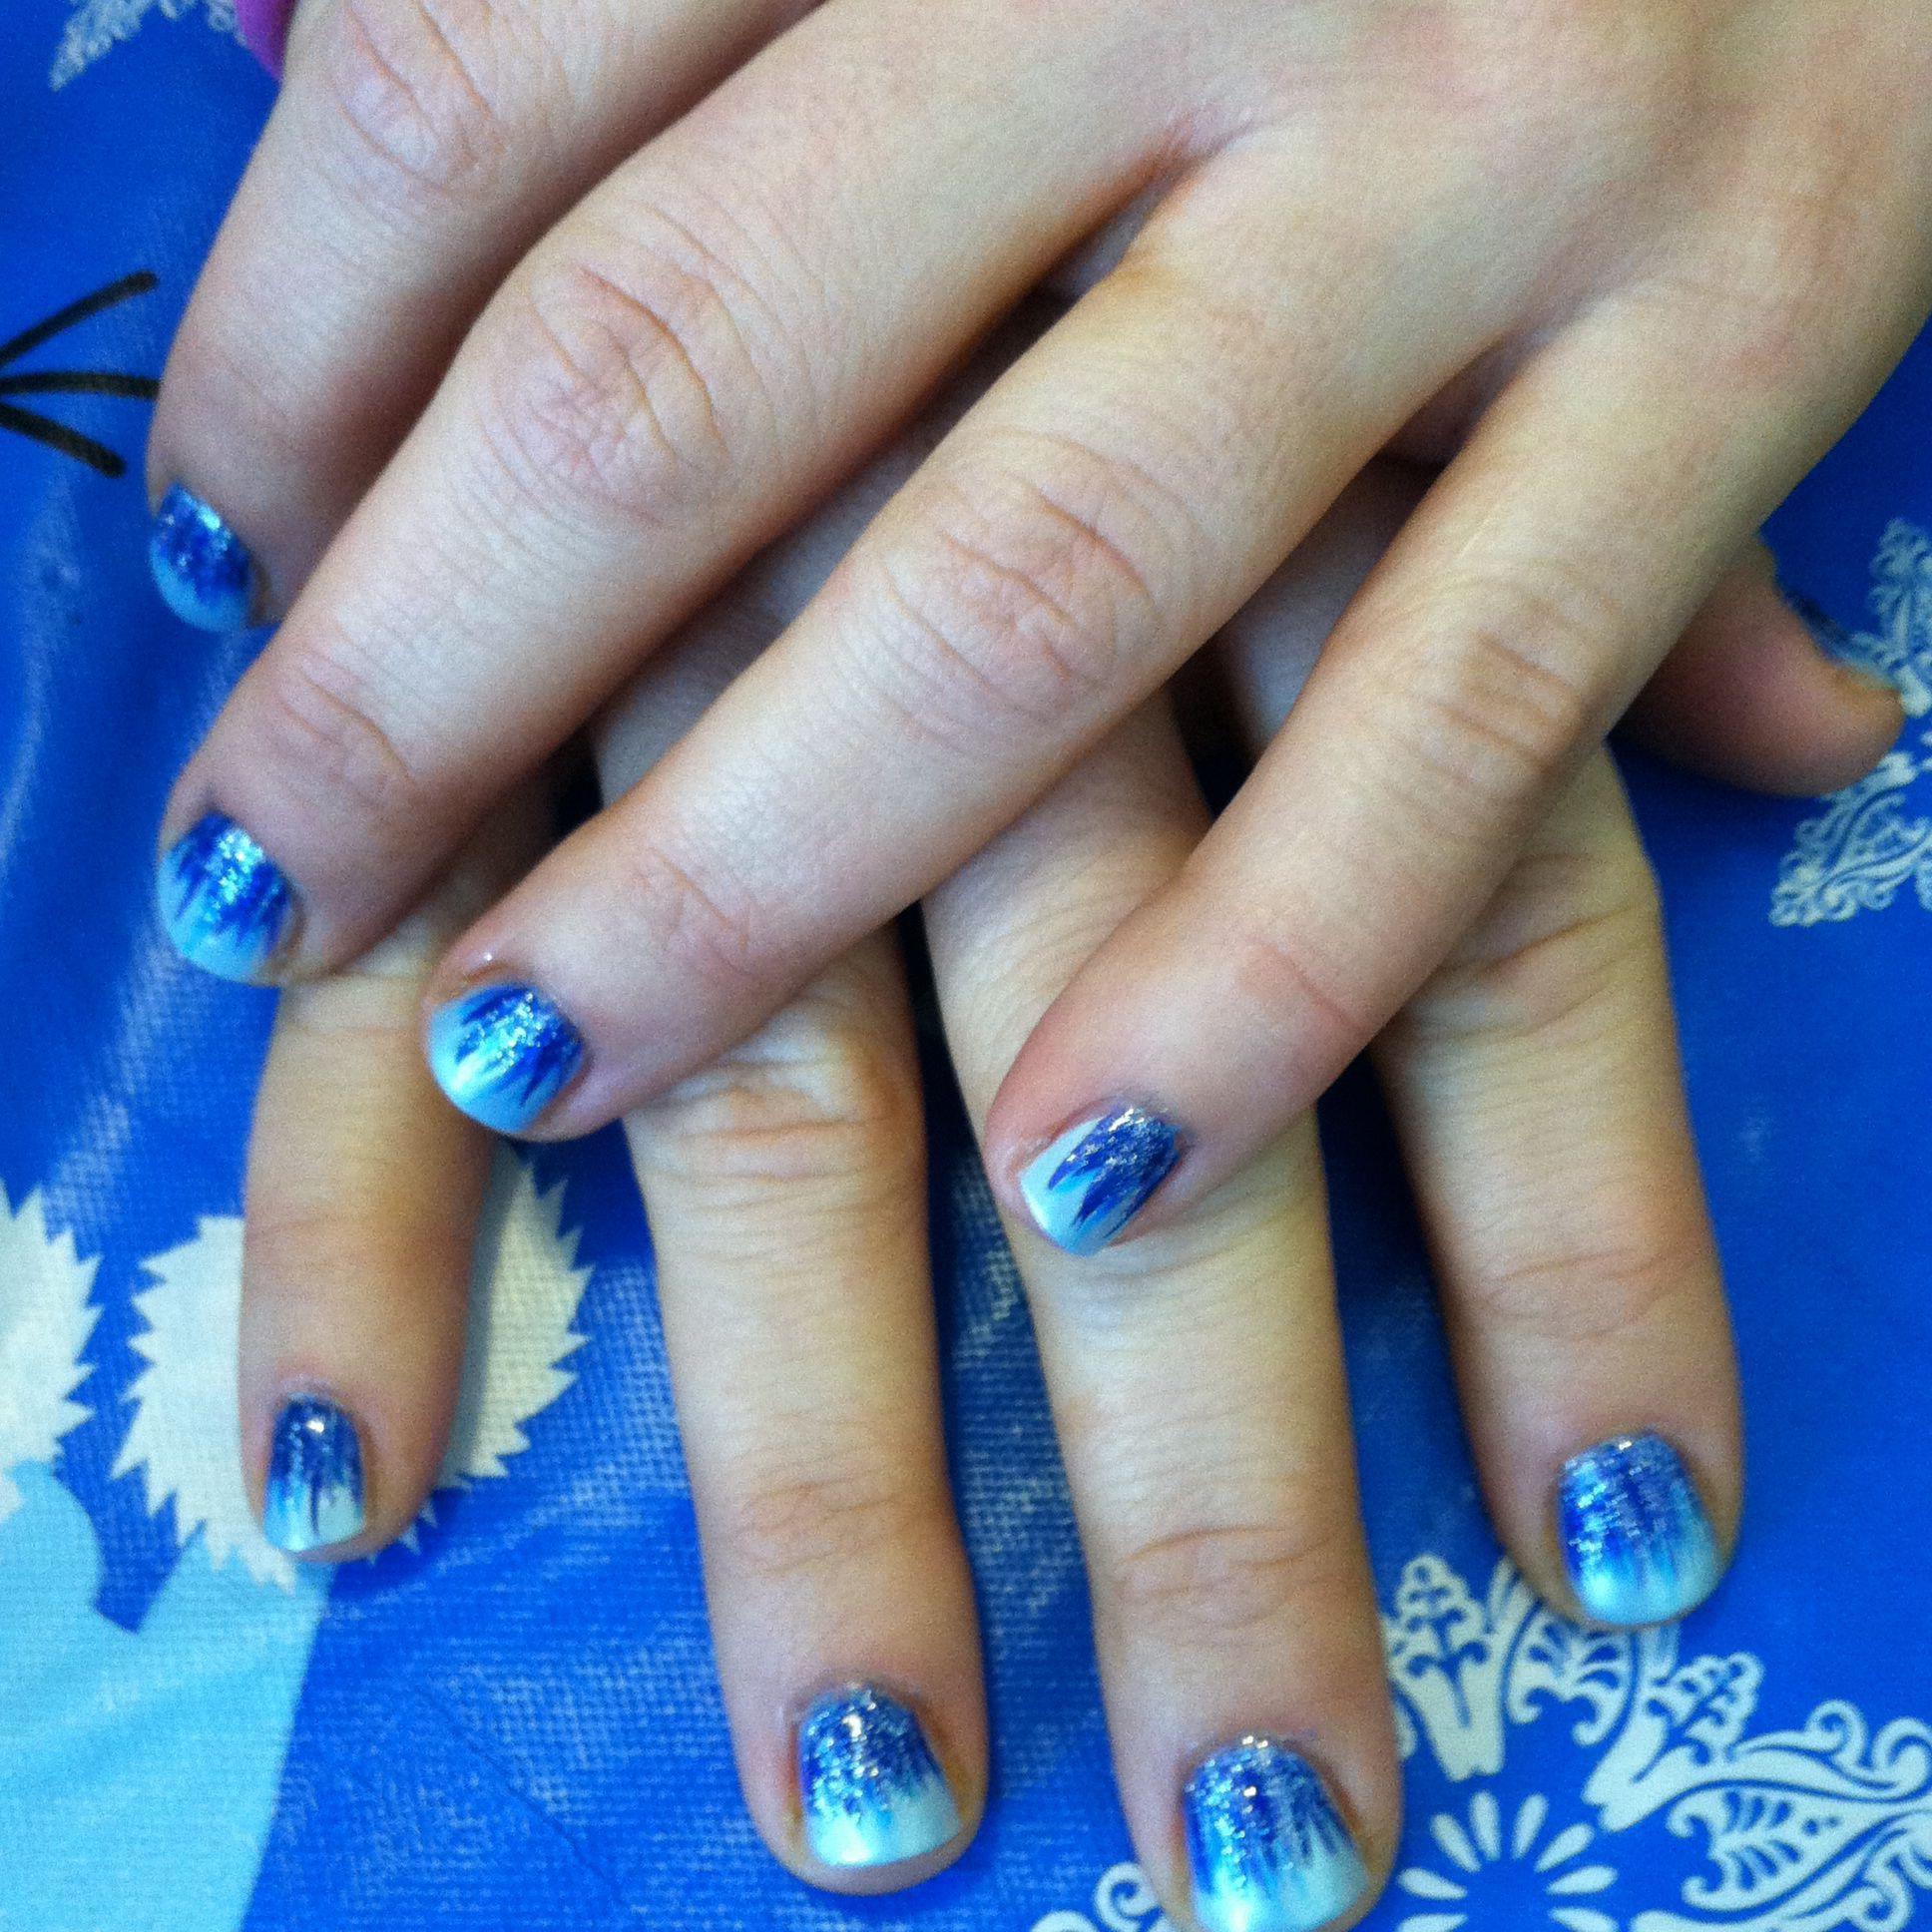 Frozen blue nail design | My Own Nail Art | Pinterest | Blue nails